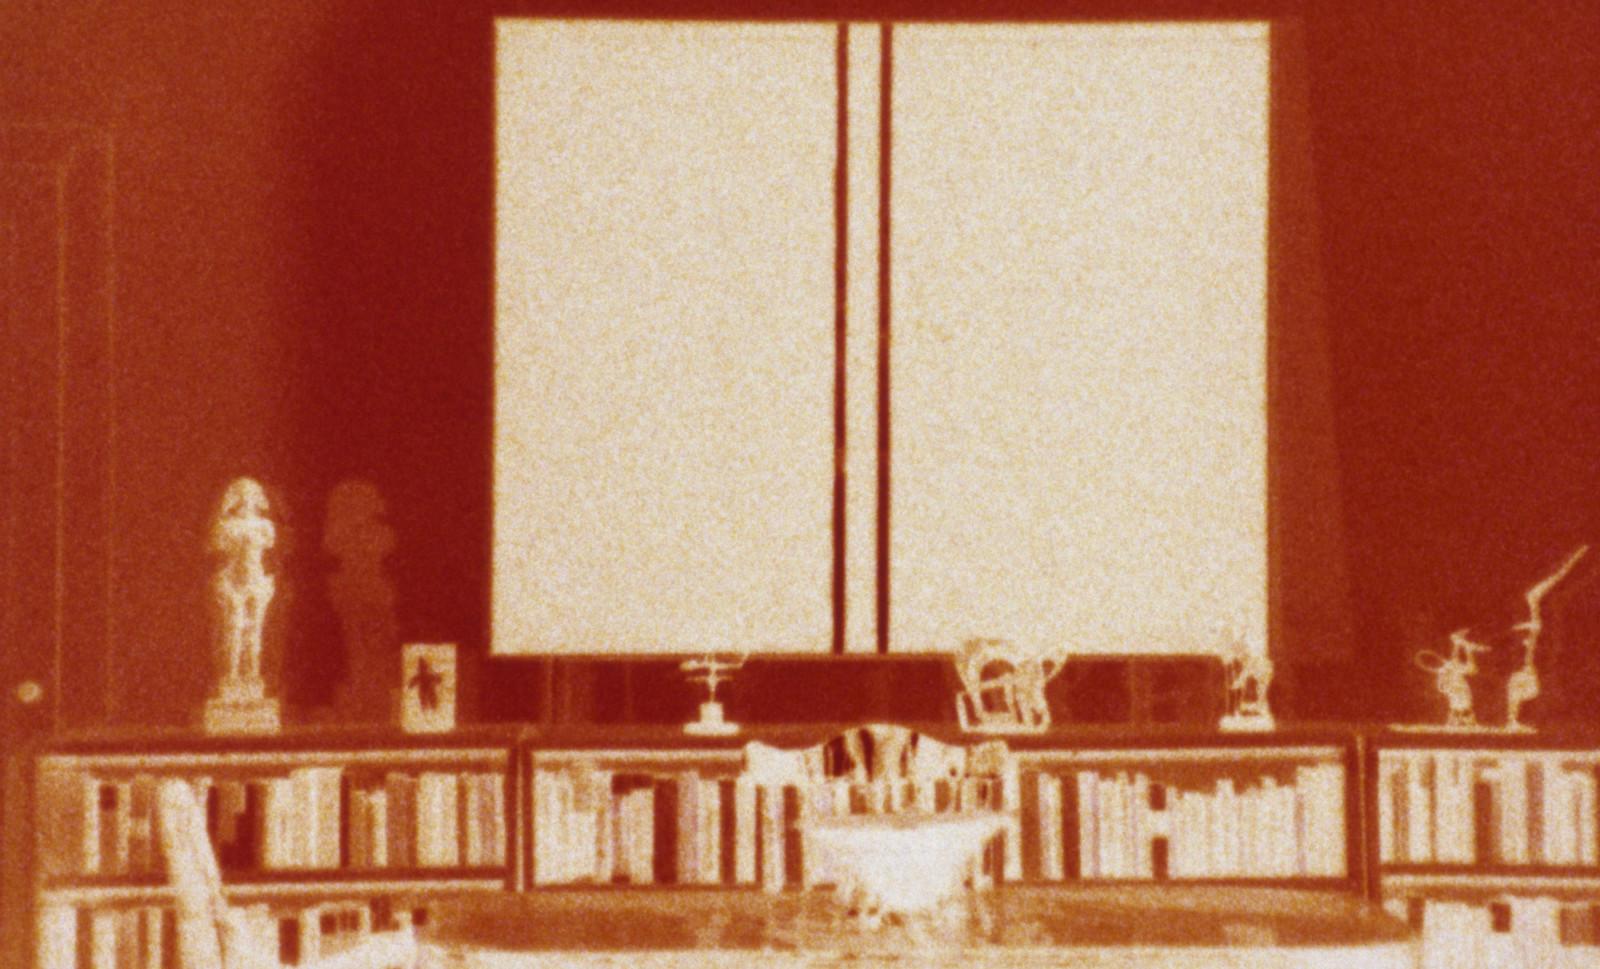 Video by Paul Sietsema, , dated 2002